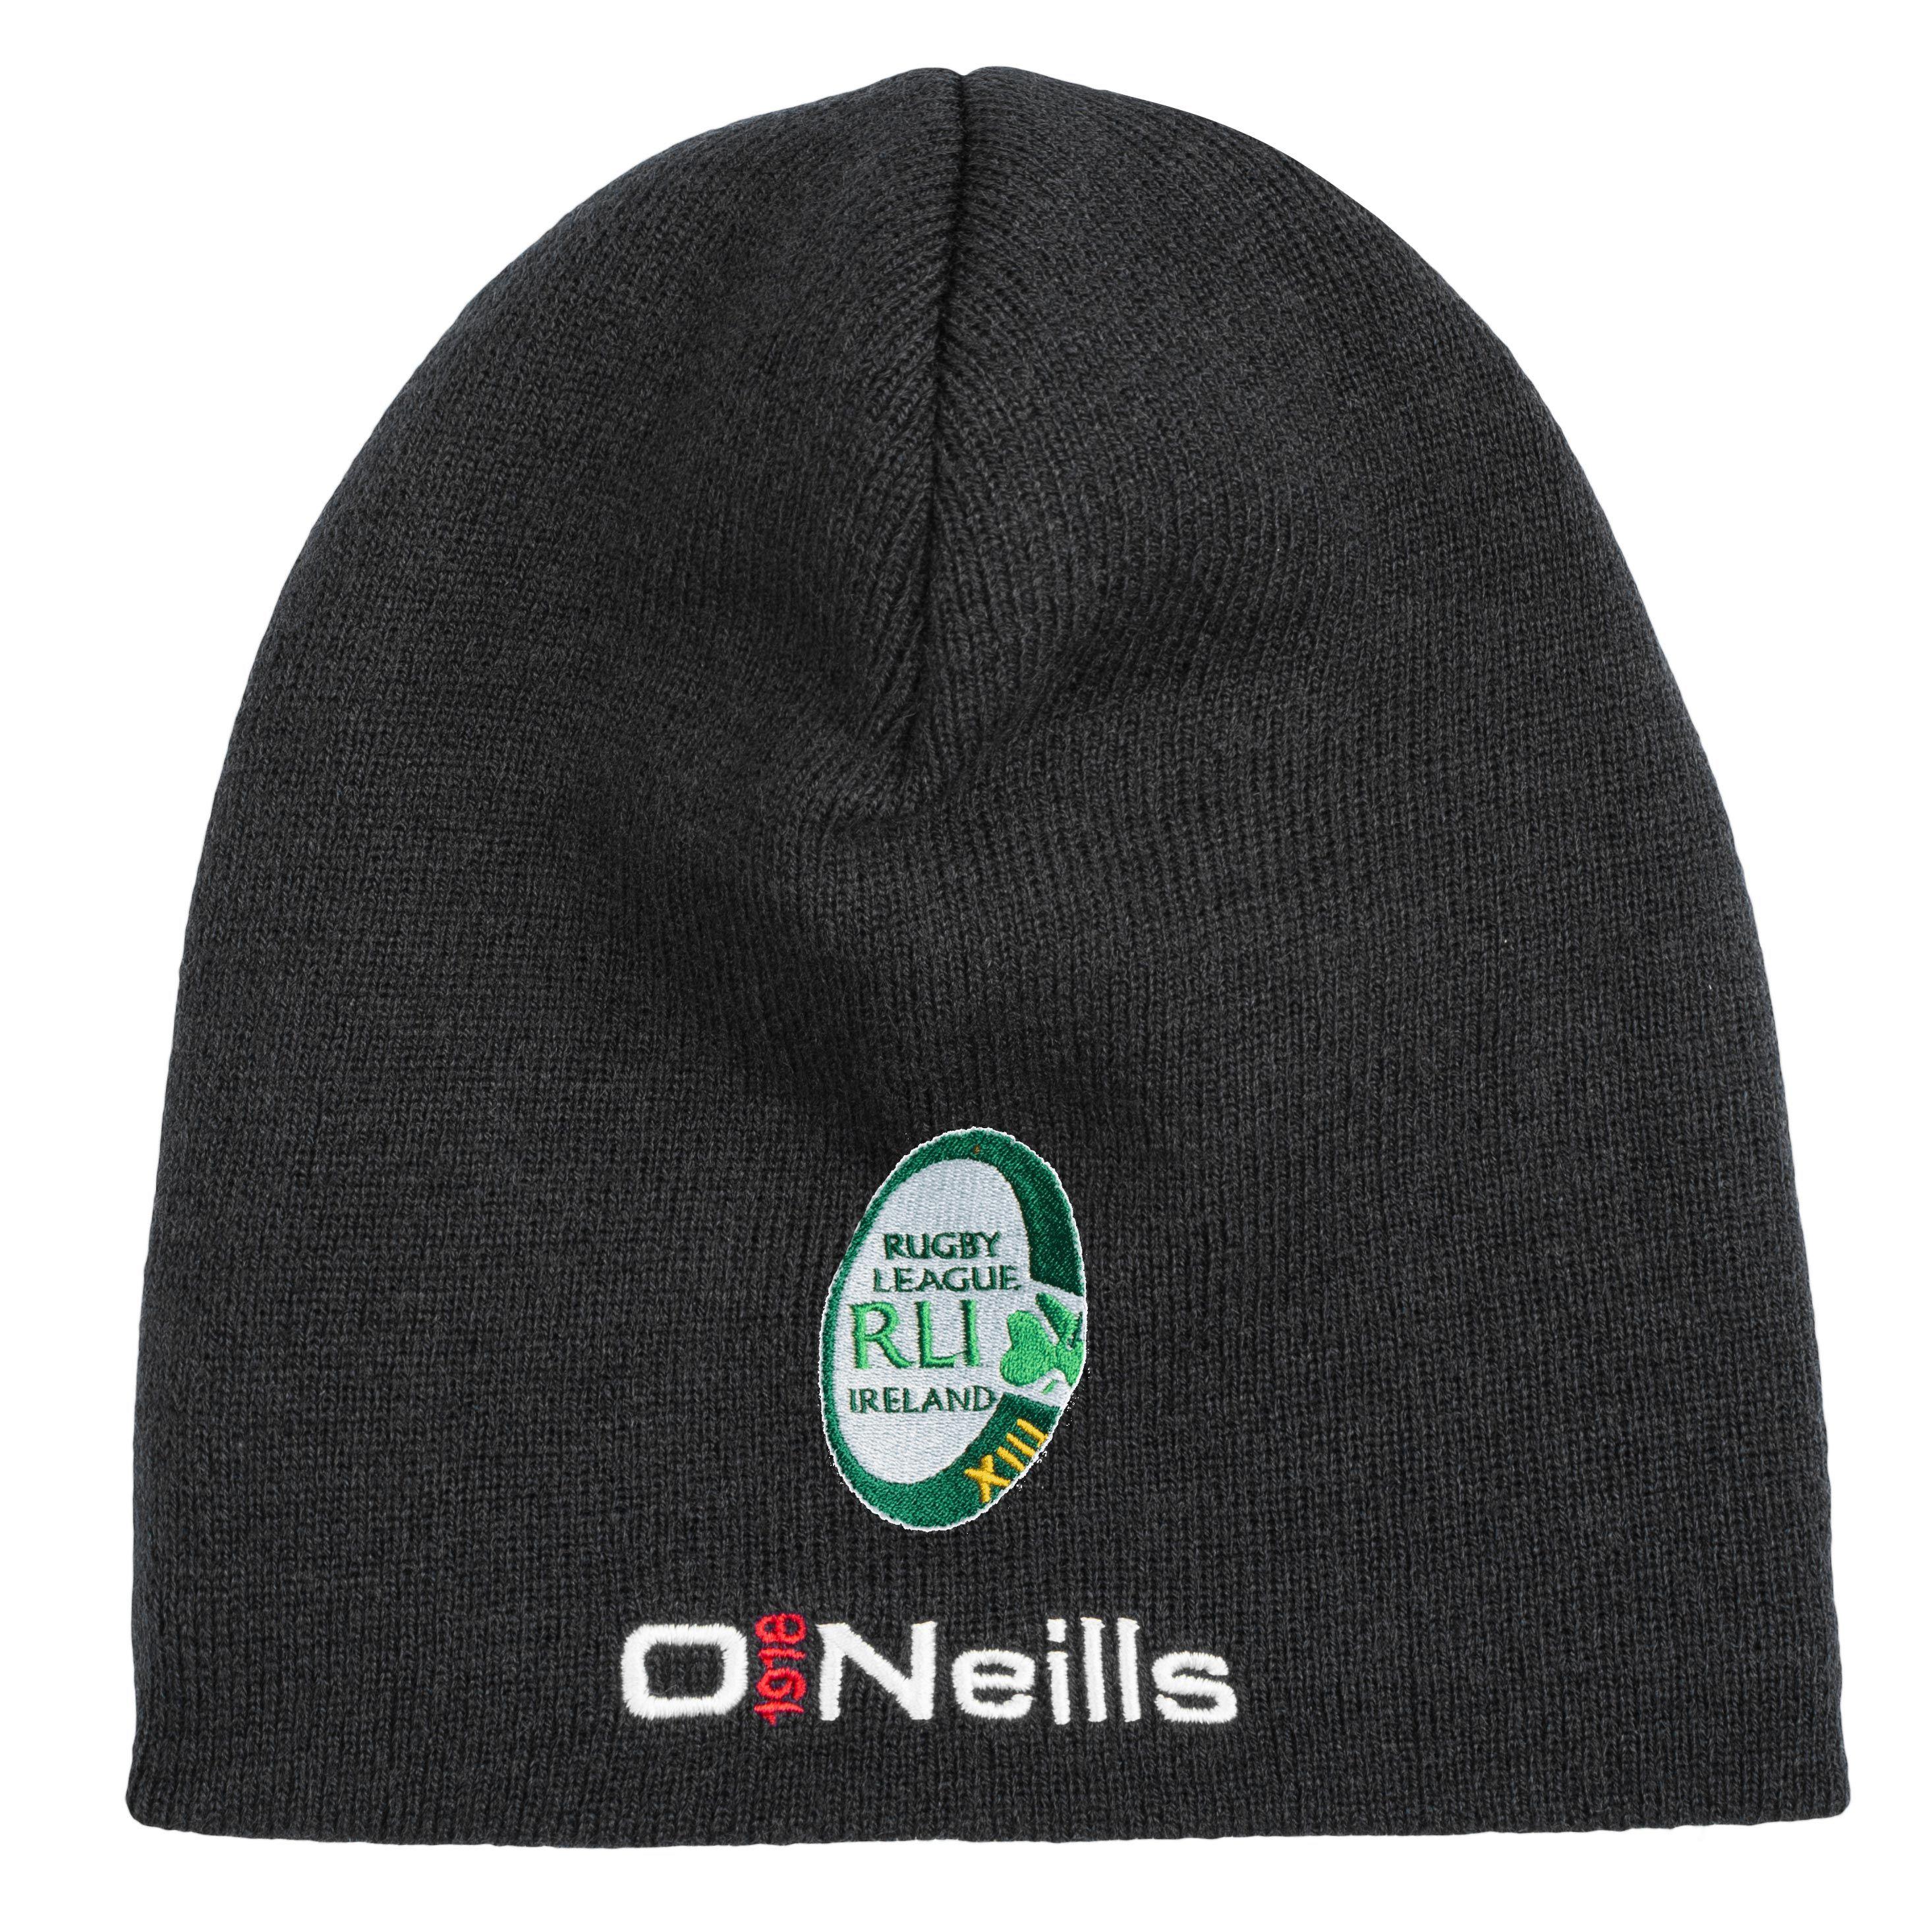 2c0c8dfa3 Rugby League Ireland Beanie Hat